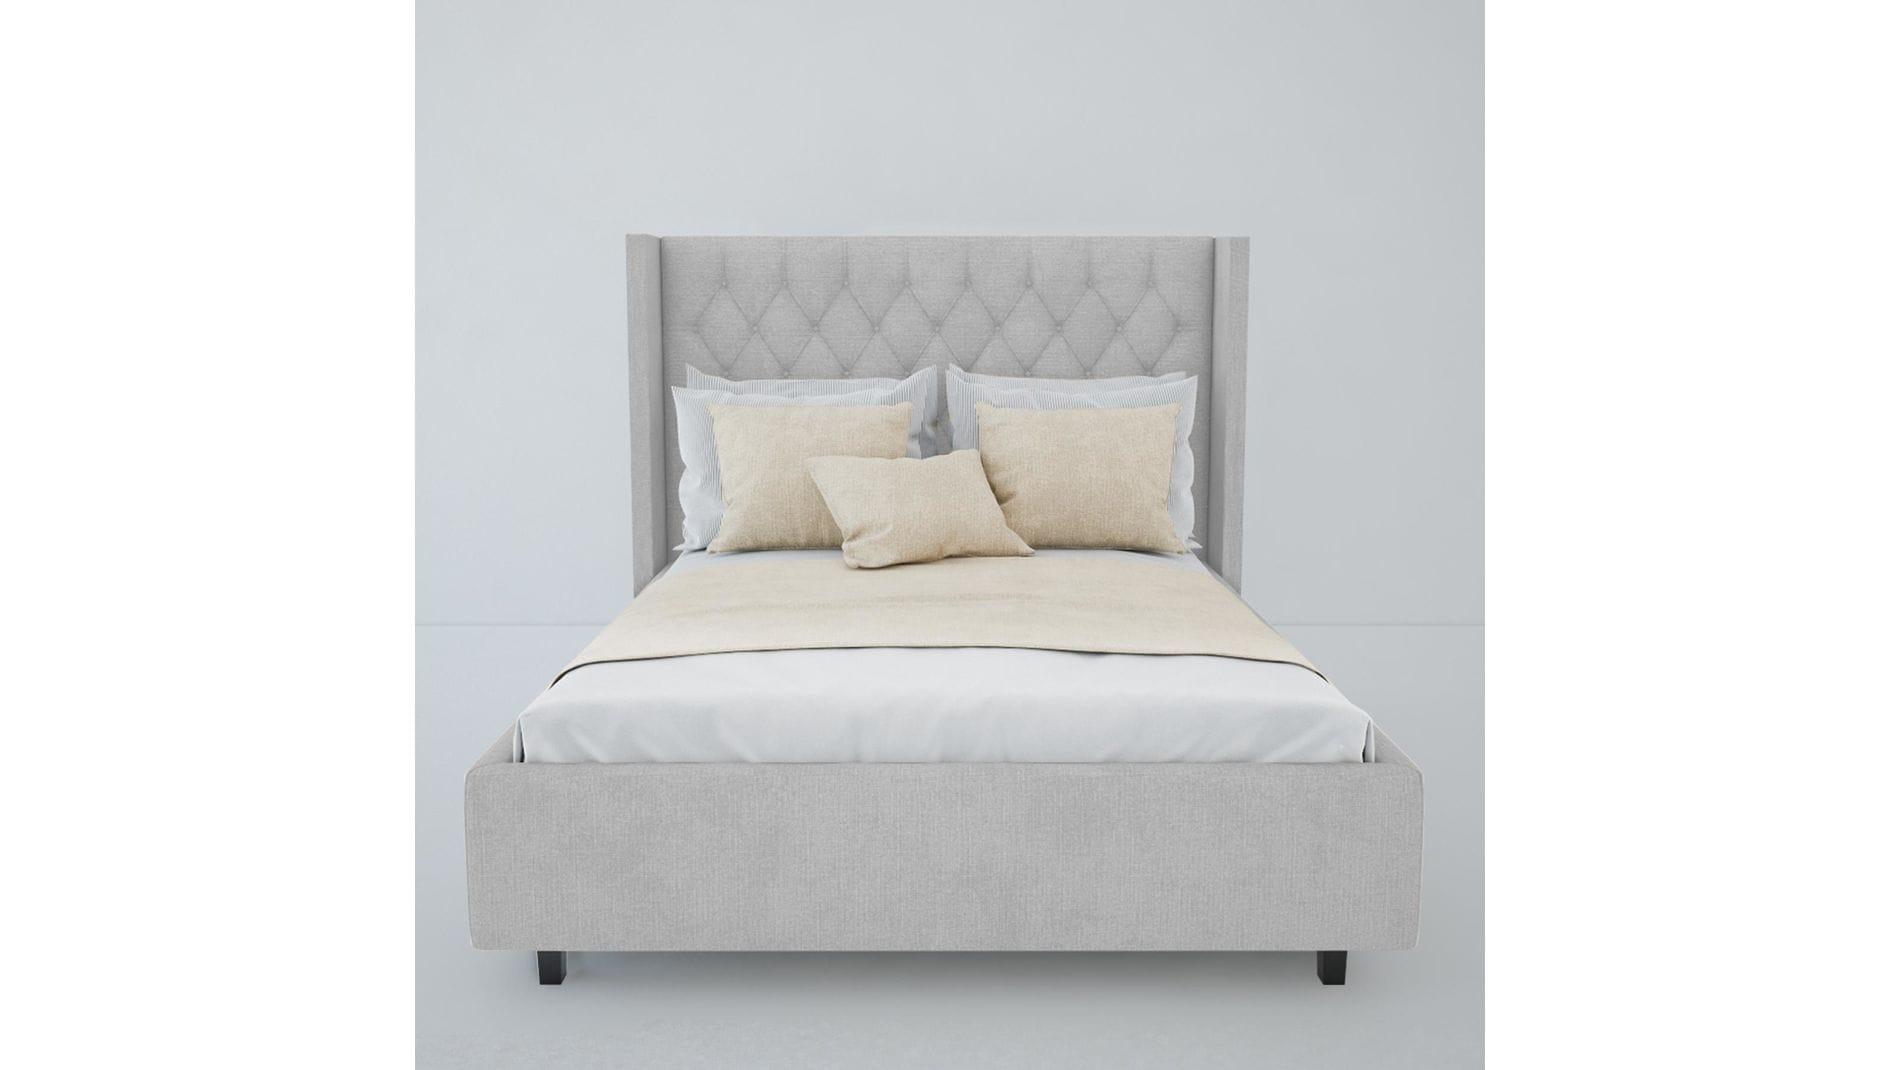 Кровать Wing-2 160х200 Велюр Молочный Р